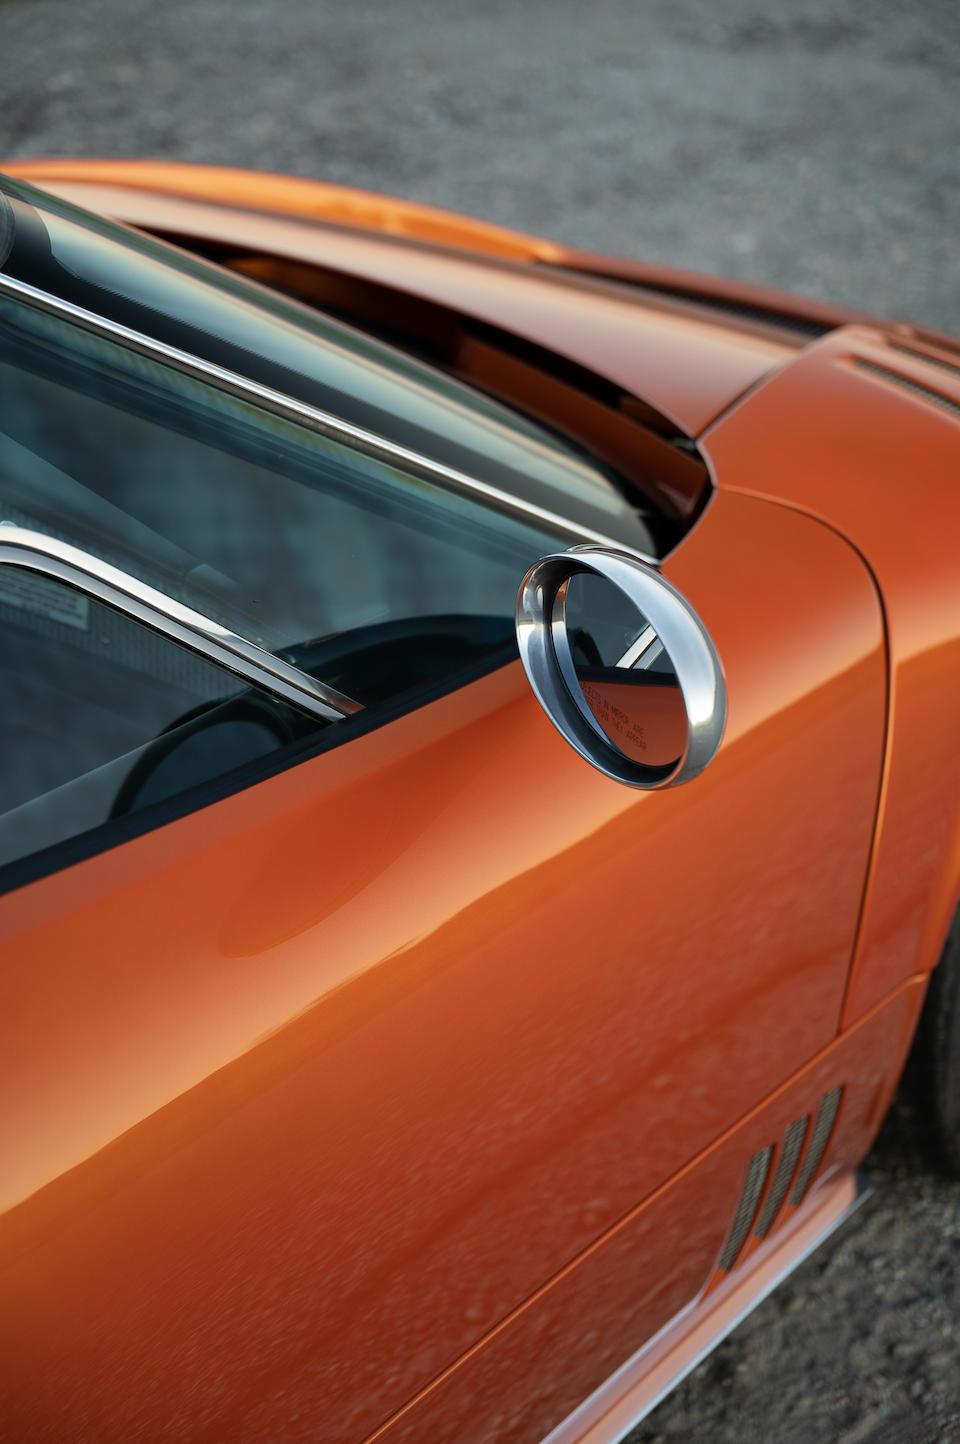 <B>2009 Spyker C8 'Laviolette' Coupe </B> <br /> VIN. XL9BA11G39Z363223